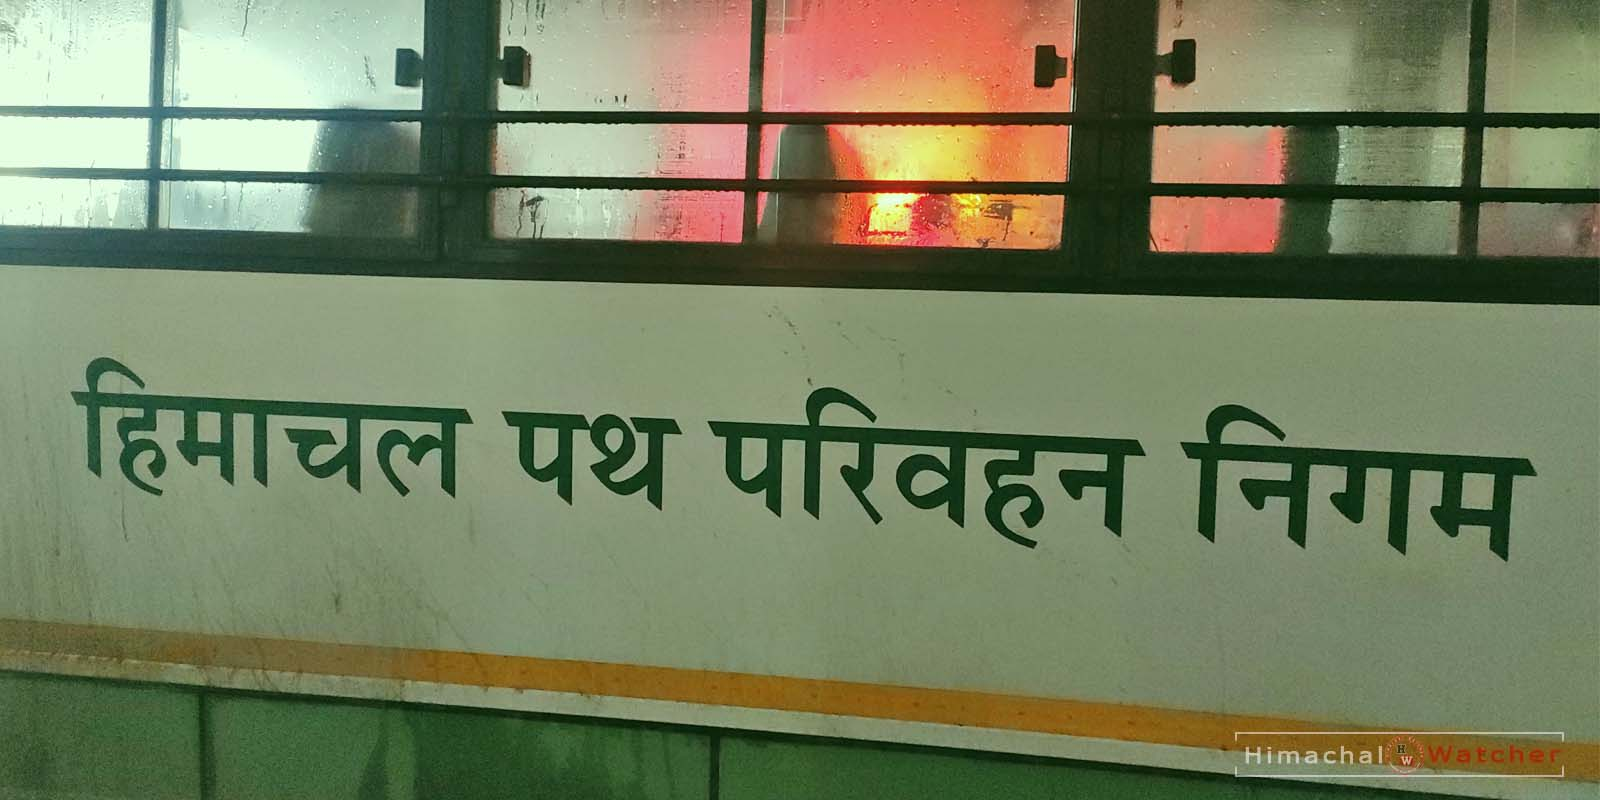 Fake Delhi-Himachal Bus Bookings Amid Lockdonw